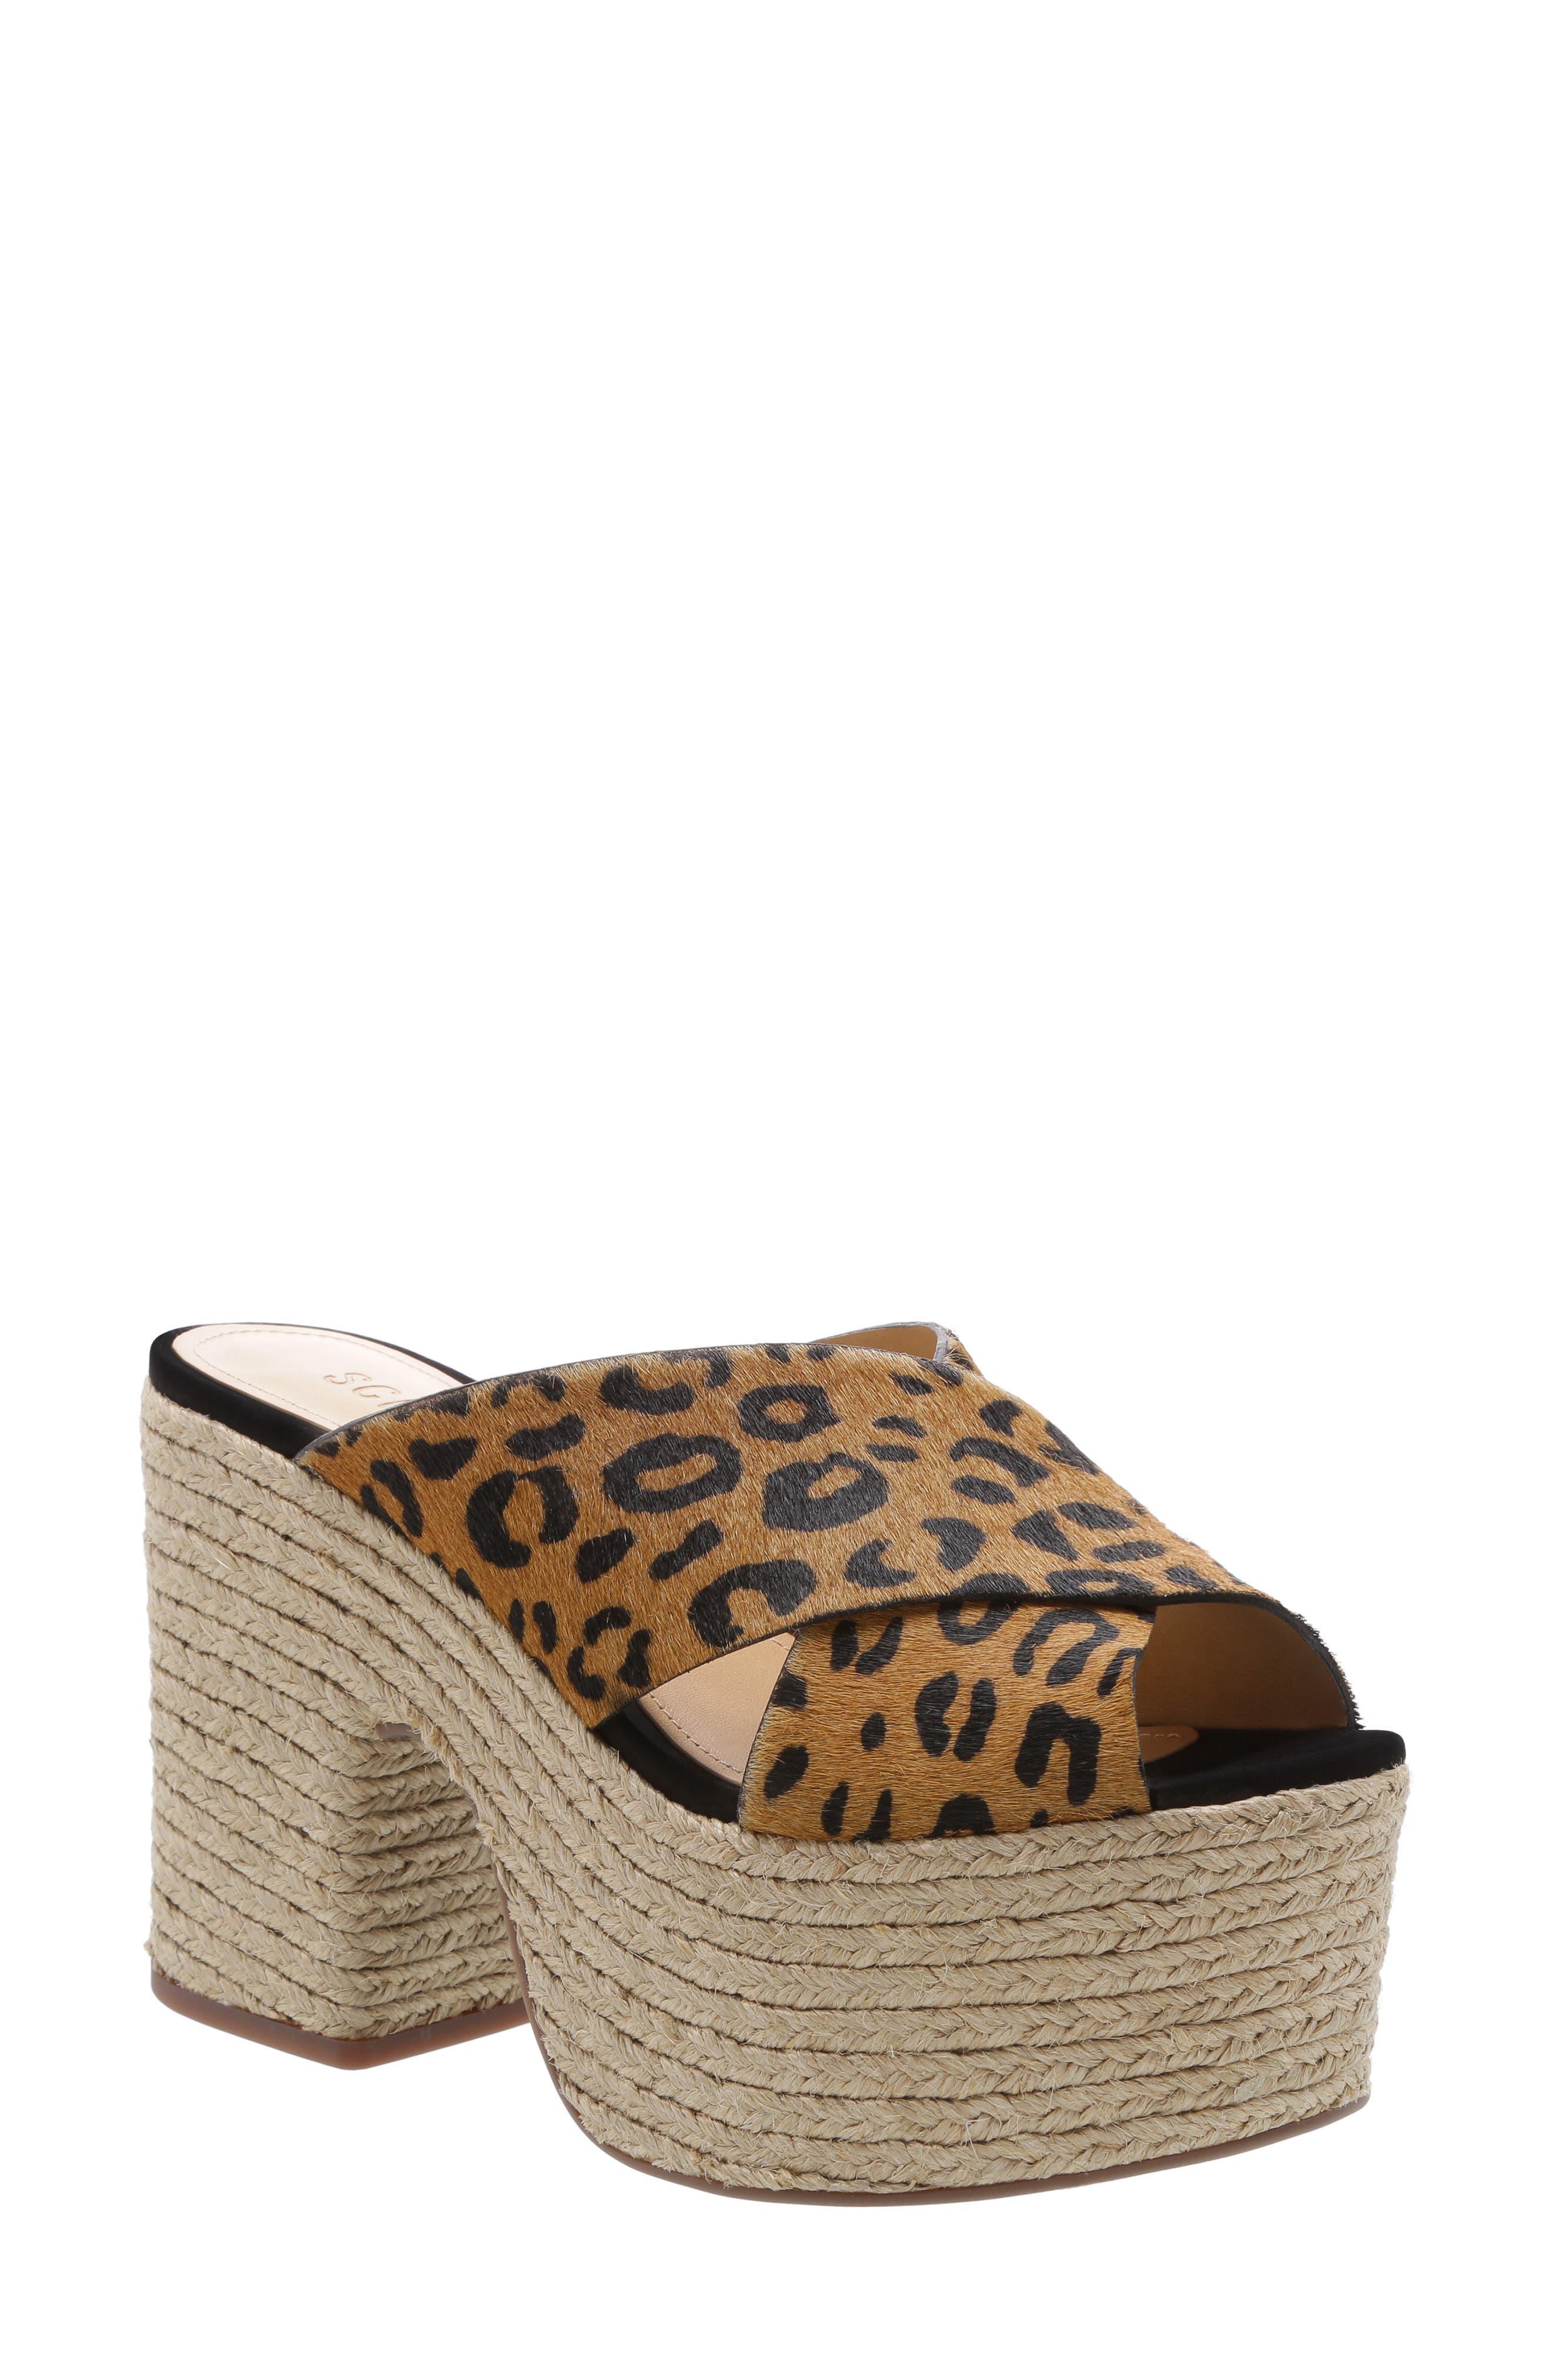 Schutz Lora Platform Genuine Calf Hair Sandal, Black